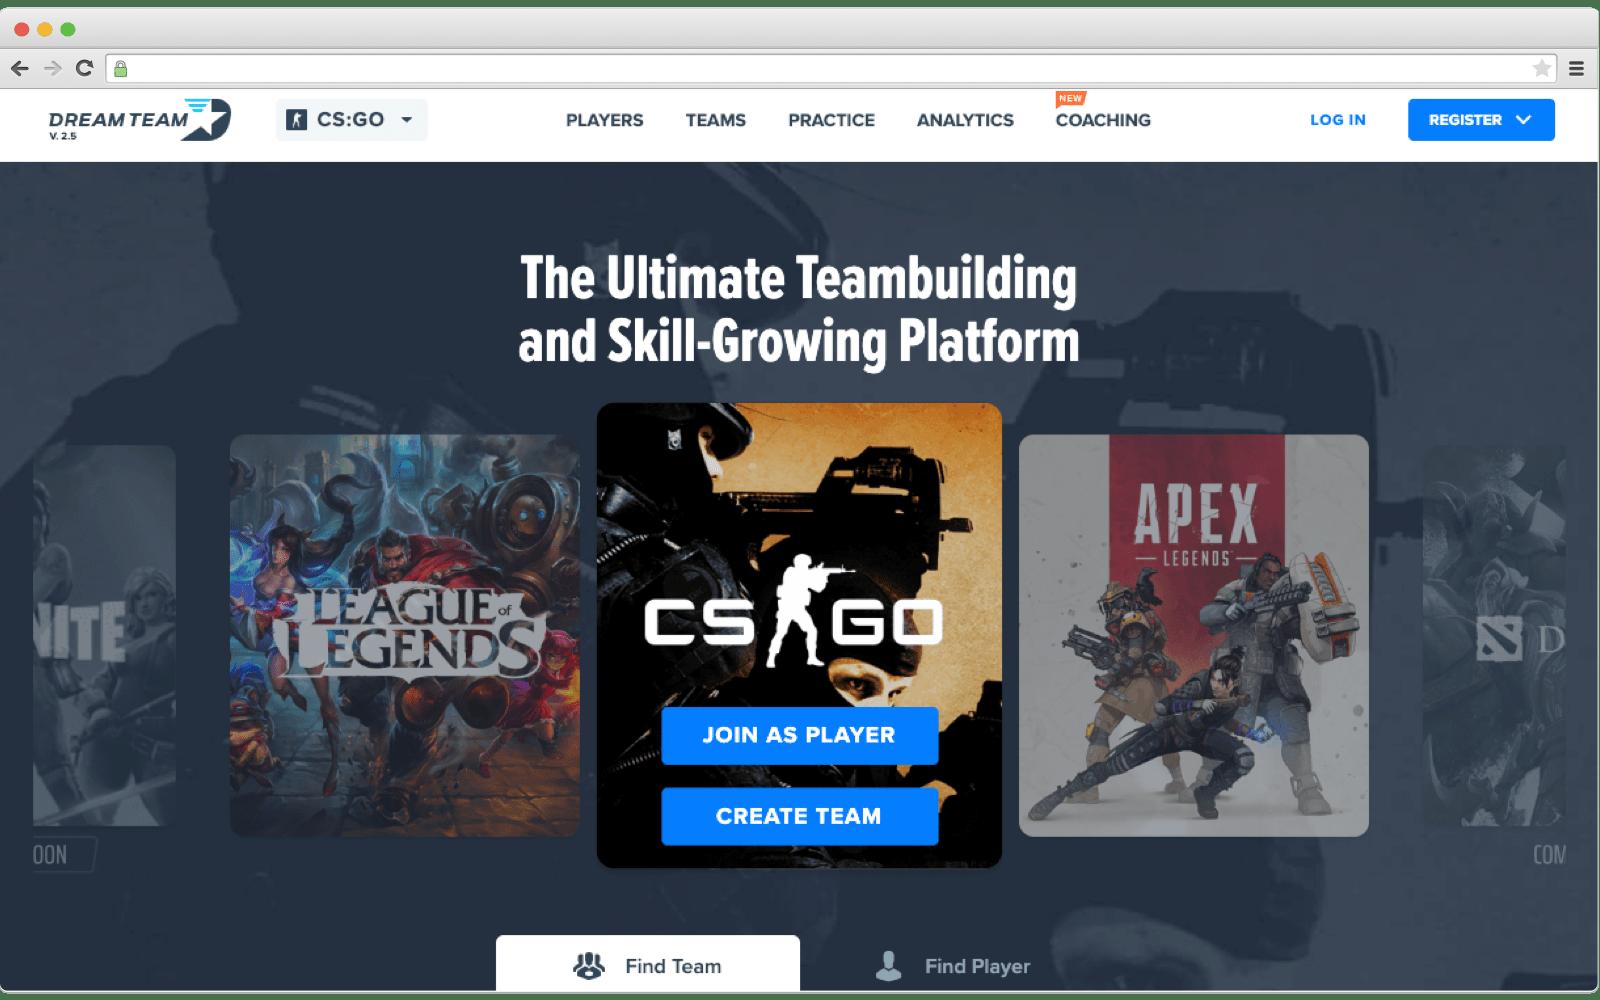 Blockchain in Gaming: DreamTeam